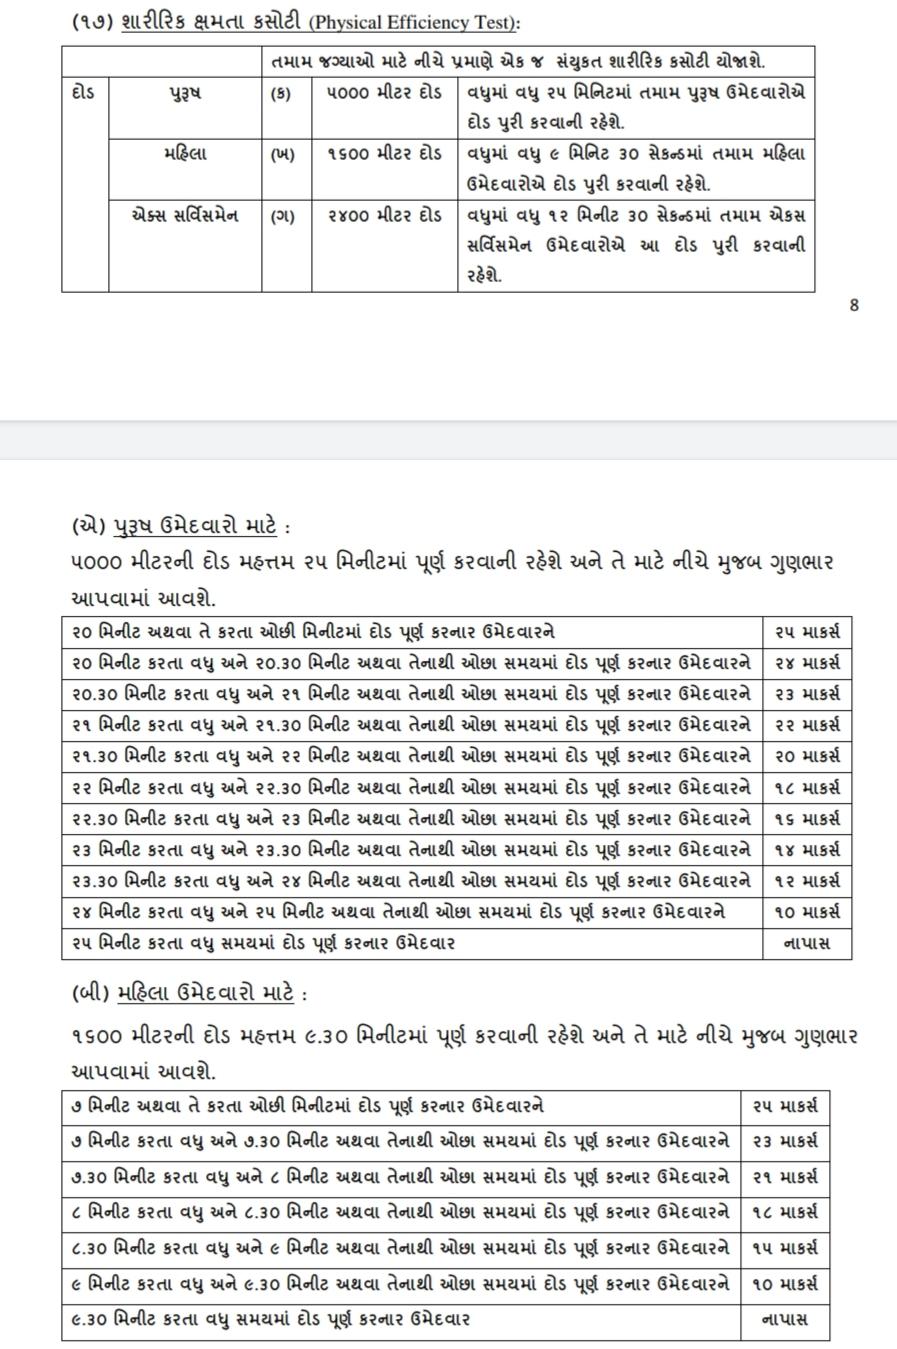 Gujarat police bhartiz Gujarat police bharti 2021, Police gujarat bharti,Gujarat police recruitment 2021, Lrb gujarat 2018, Gujarat police bharti 2020, Gujarat police bharti 2021 exam date,Gujarat police bharti admit card